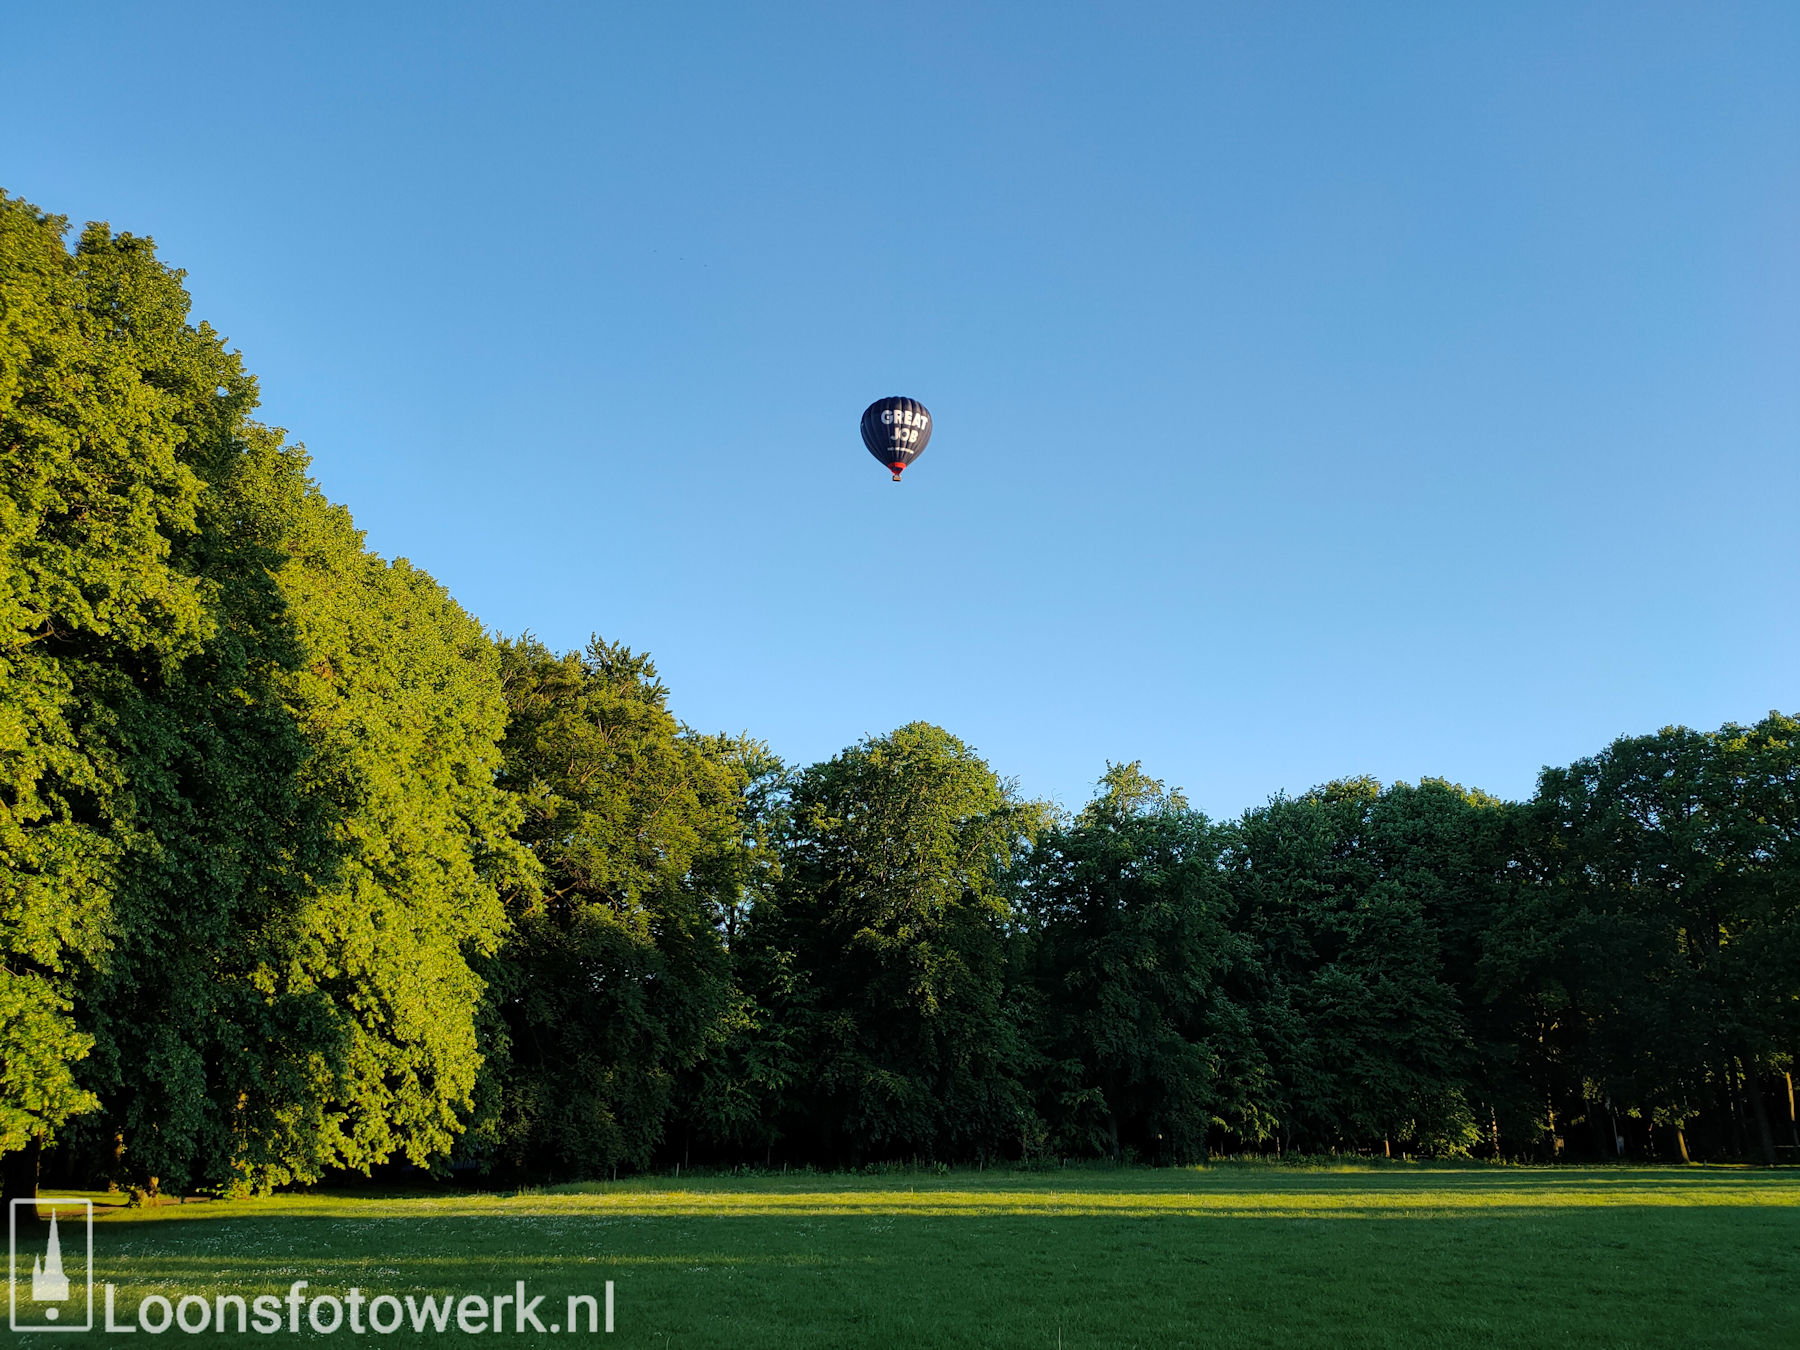 Ballonvaart vanaf de Kasteelweide 29